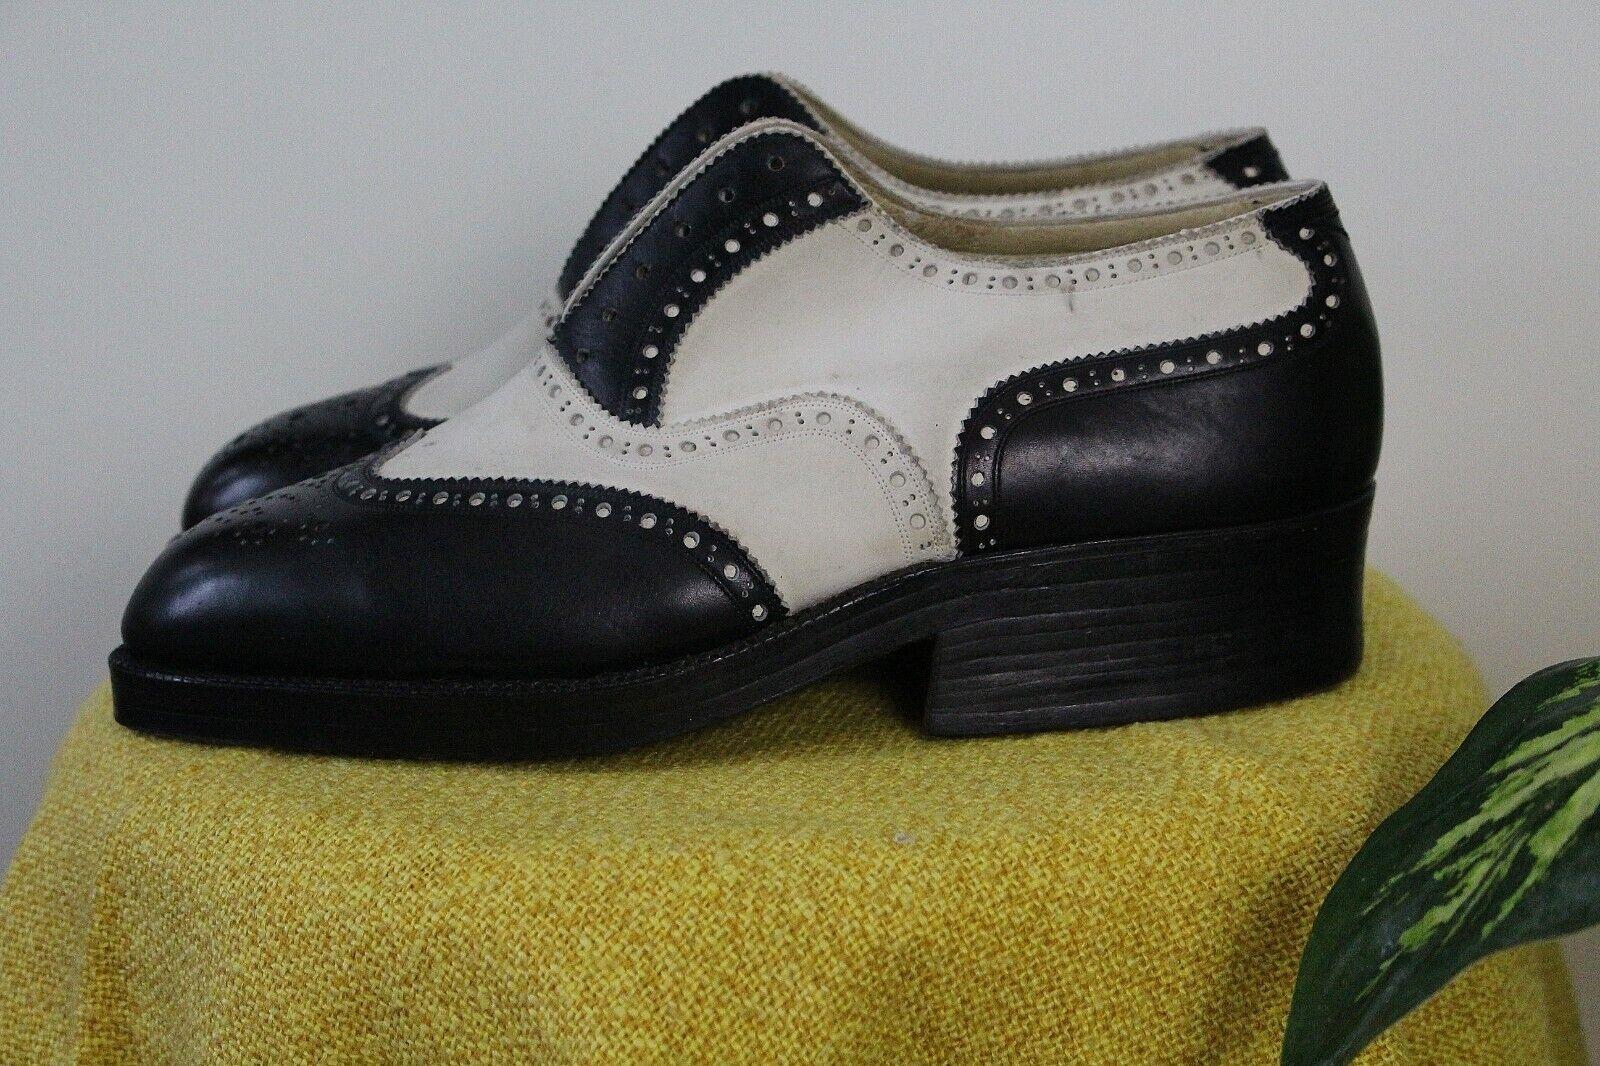 Antik Stepptanz-Schuhe 42 Unisex Leder Schnürschuhe Vintage Brogues Claquetes